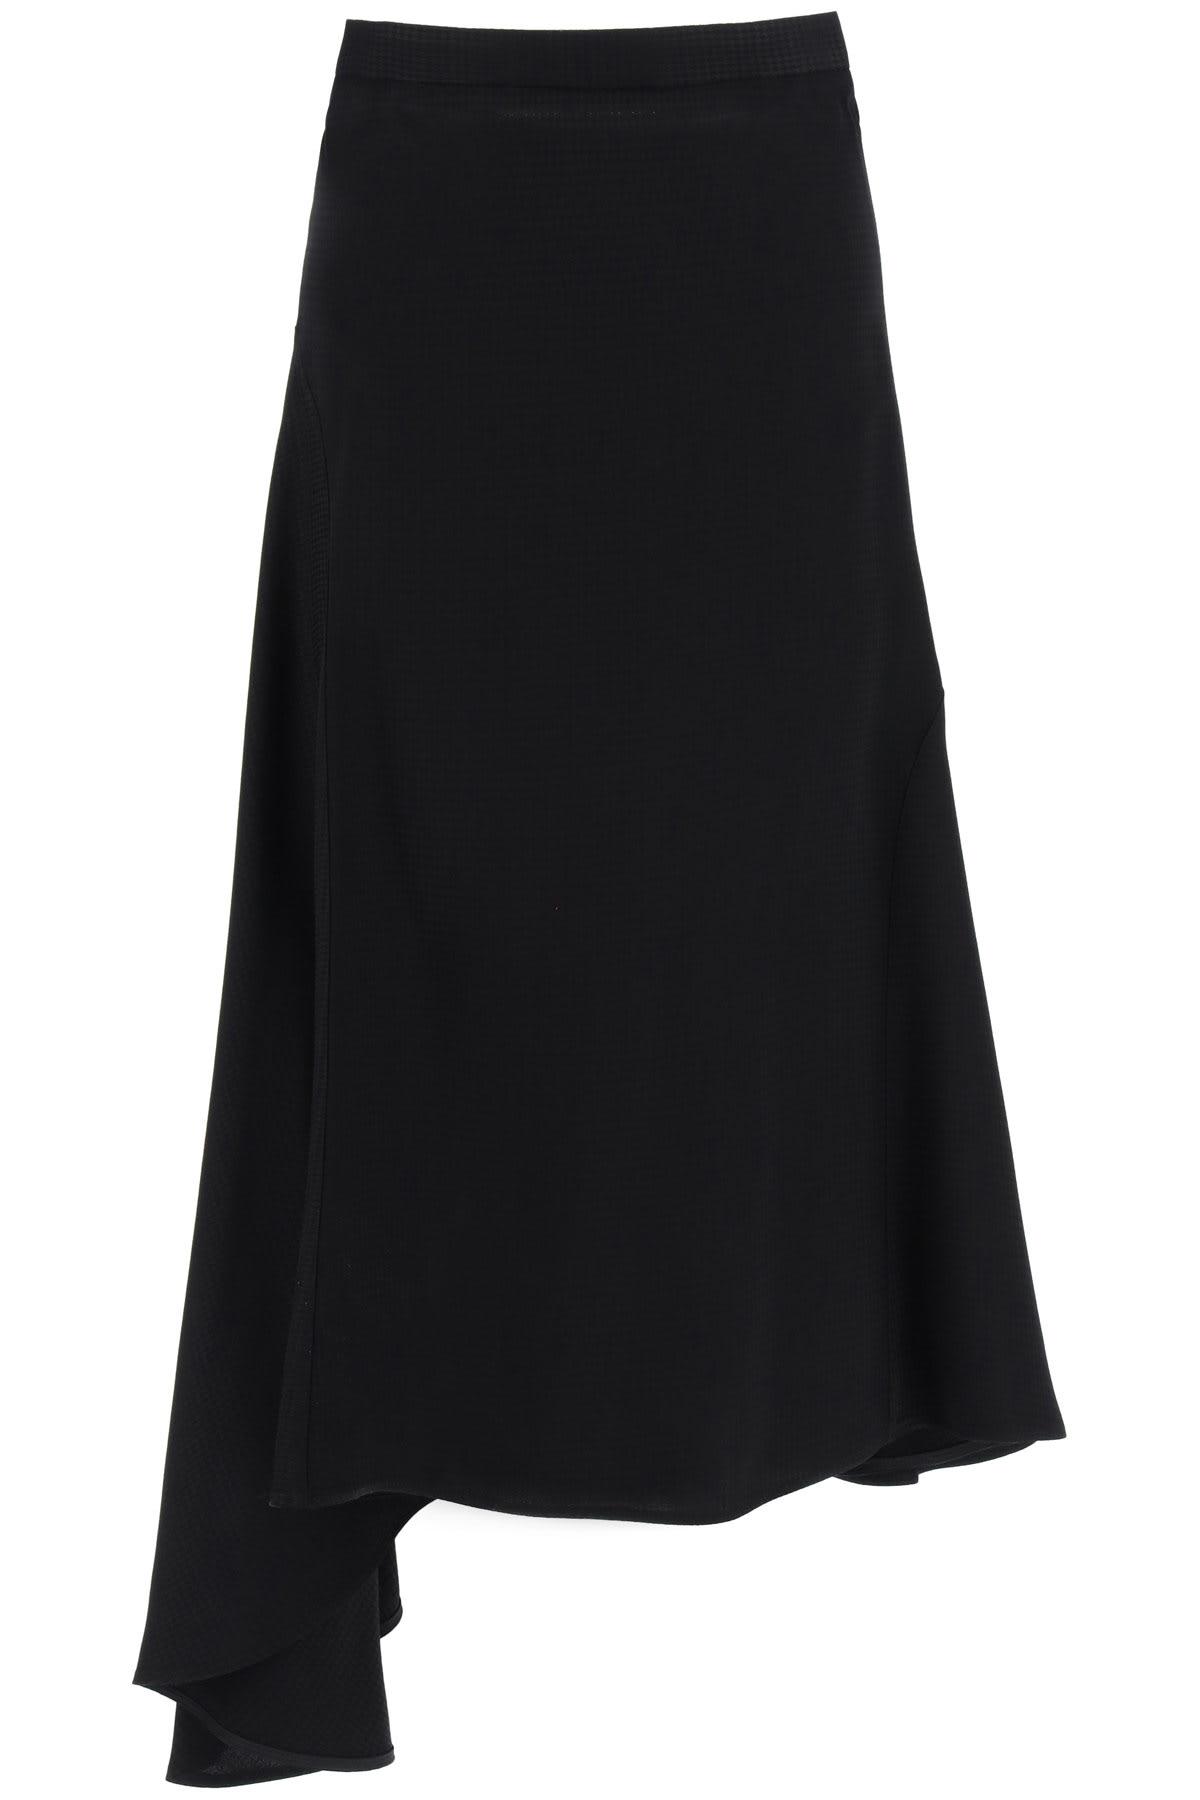 MSGM Houndstooth Midi Skirt